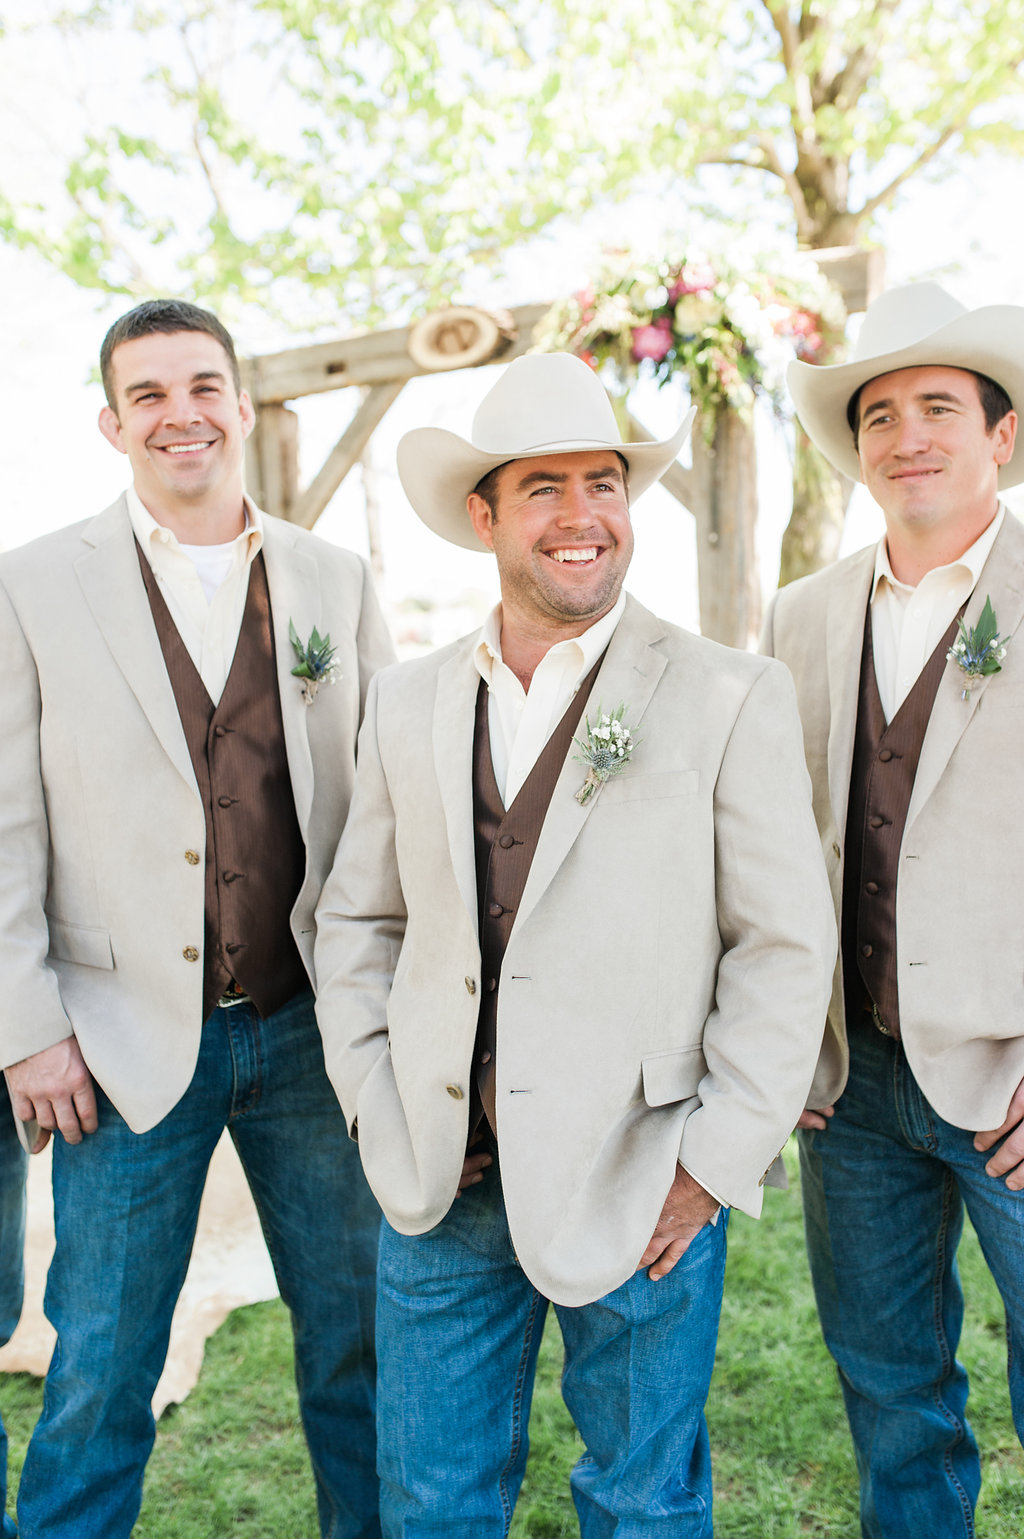 Farm Groomsmen Attire - Iowa Farm Wedding - Private Estate Weddings